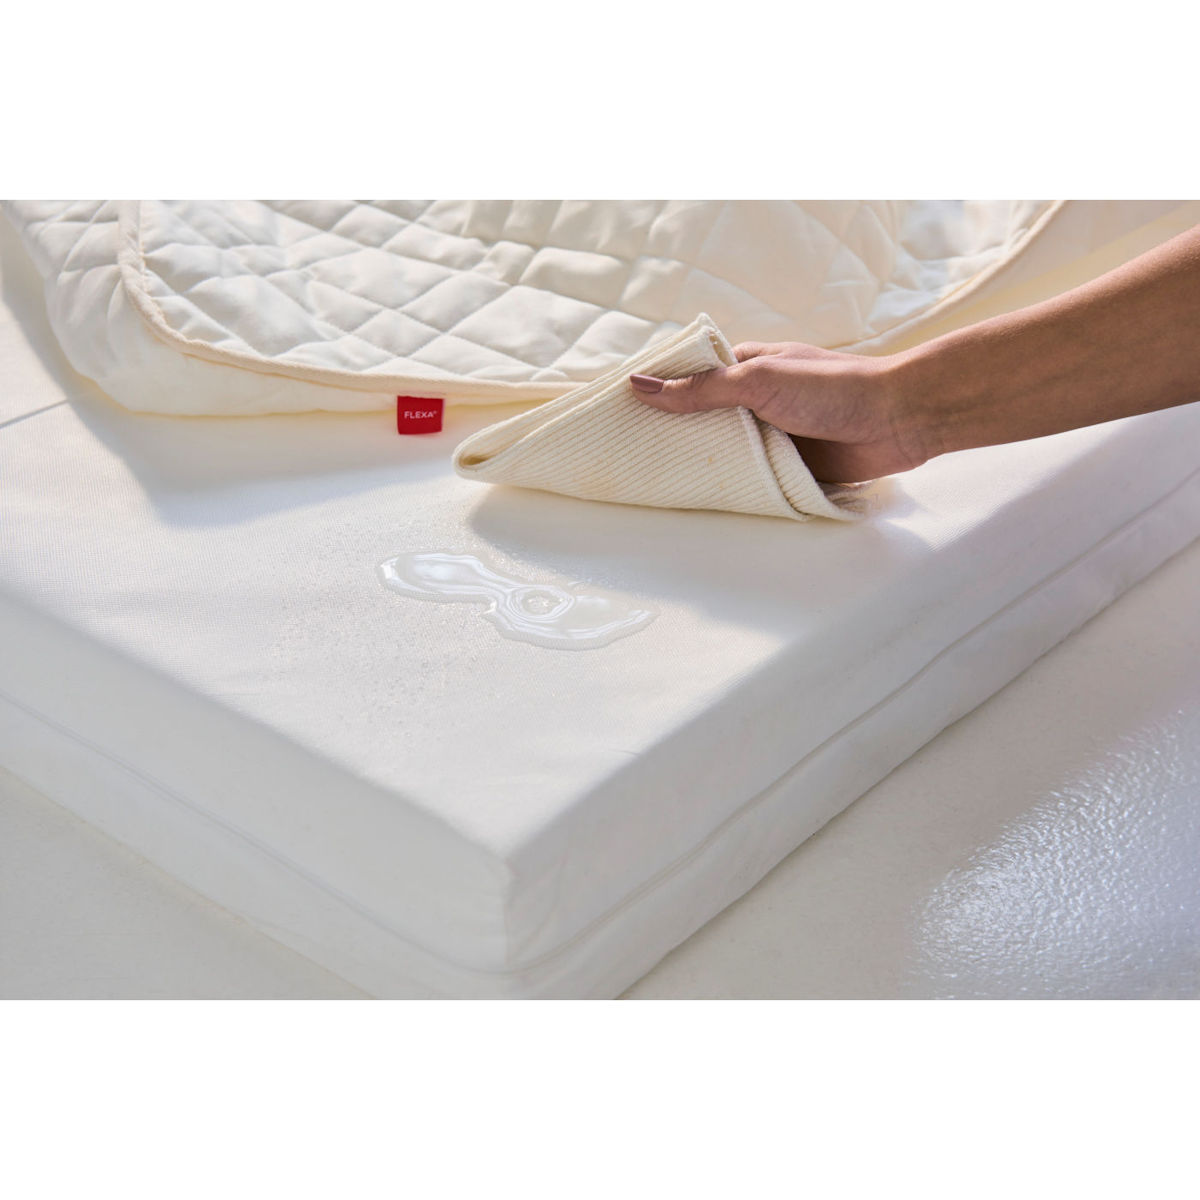 flexa classic latex matratze in creme 83 10326 272. Black Bedroom Furniture Sets. Home Design Ideas